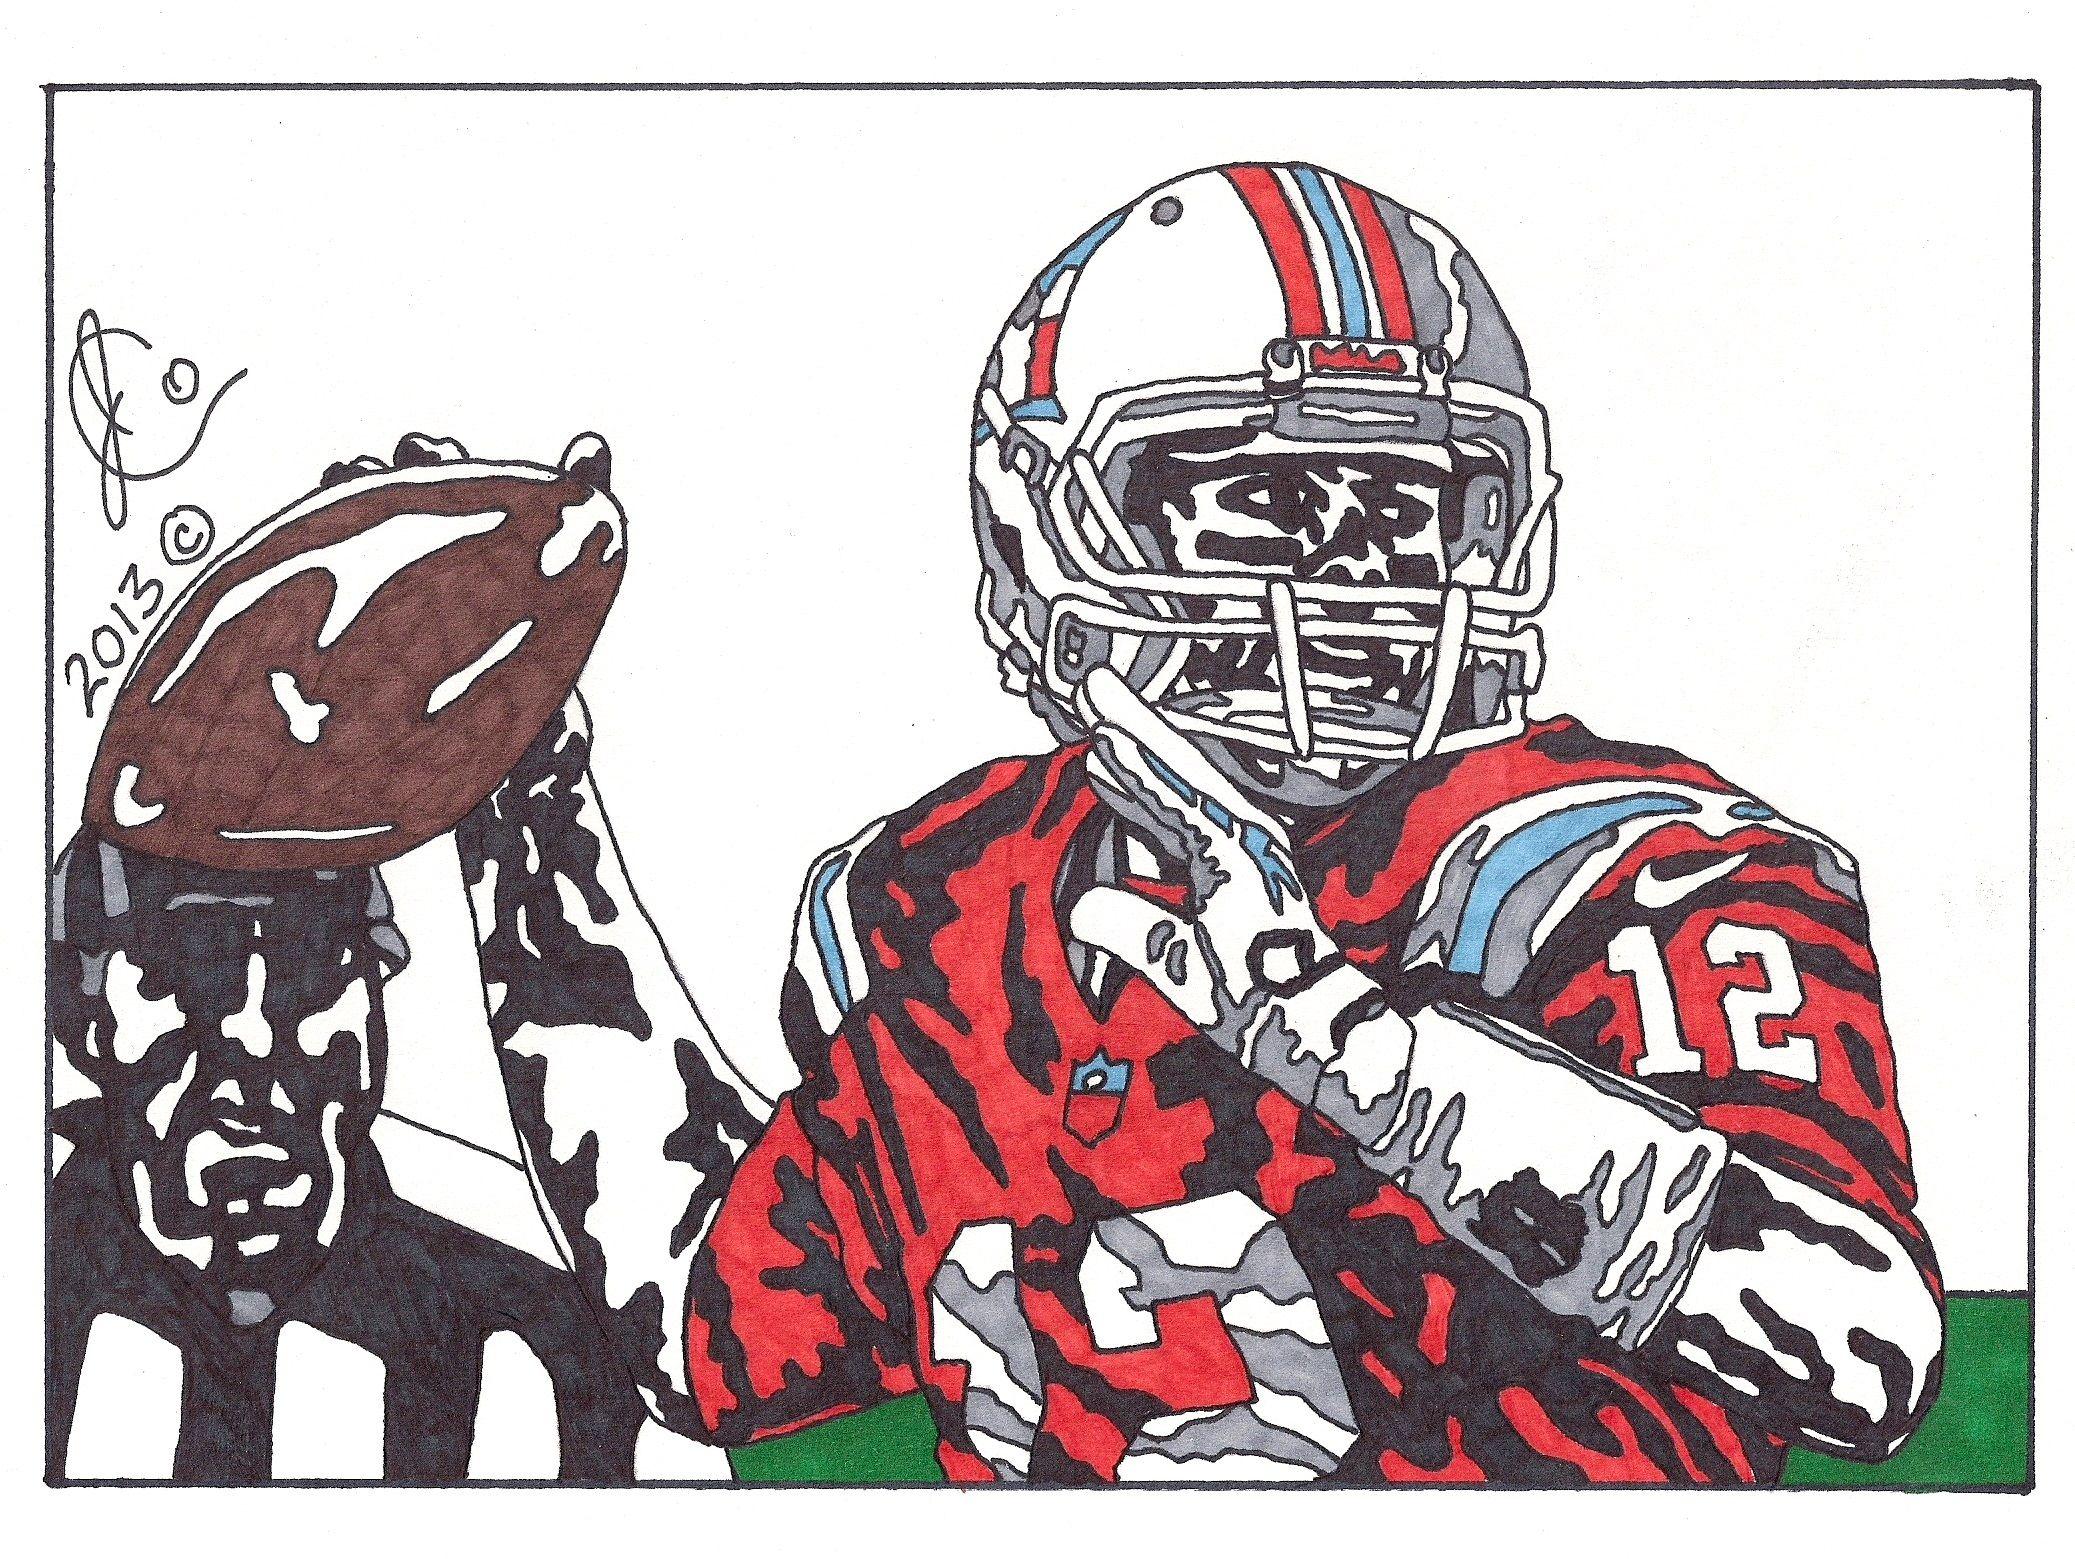 Tom Brady Ink Illustration 2 Throwback Edition By Jcolley79 Deviantart Com On Deviantart Ink Illustrations Throwback Illustration